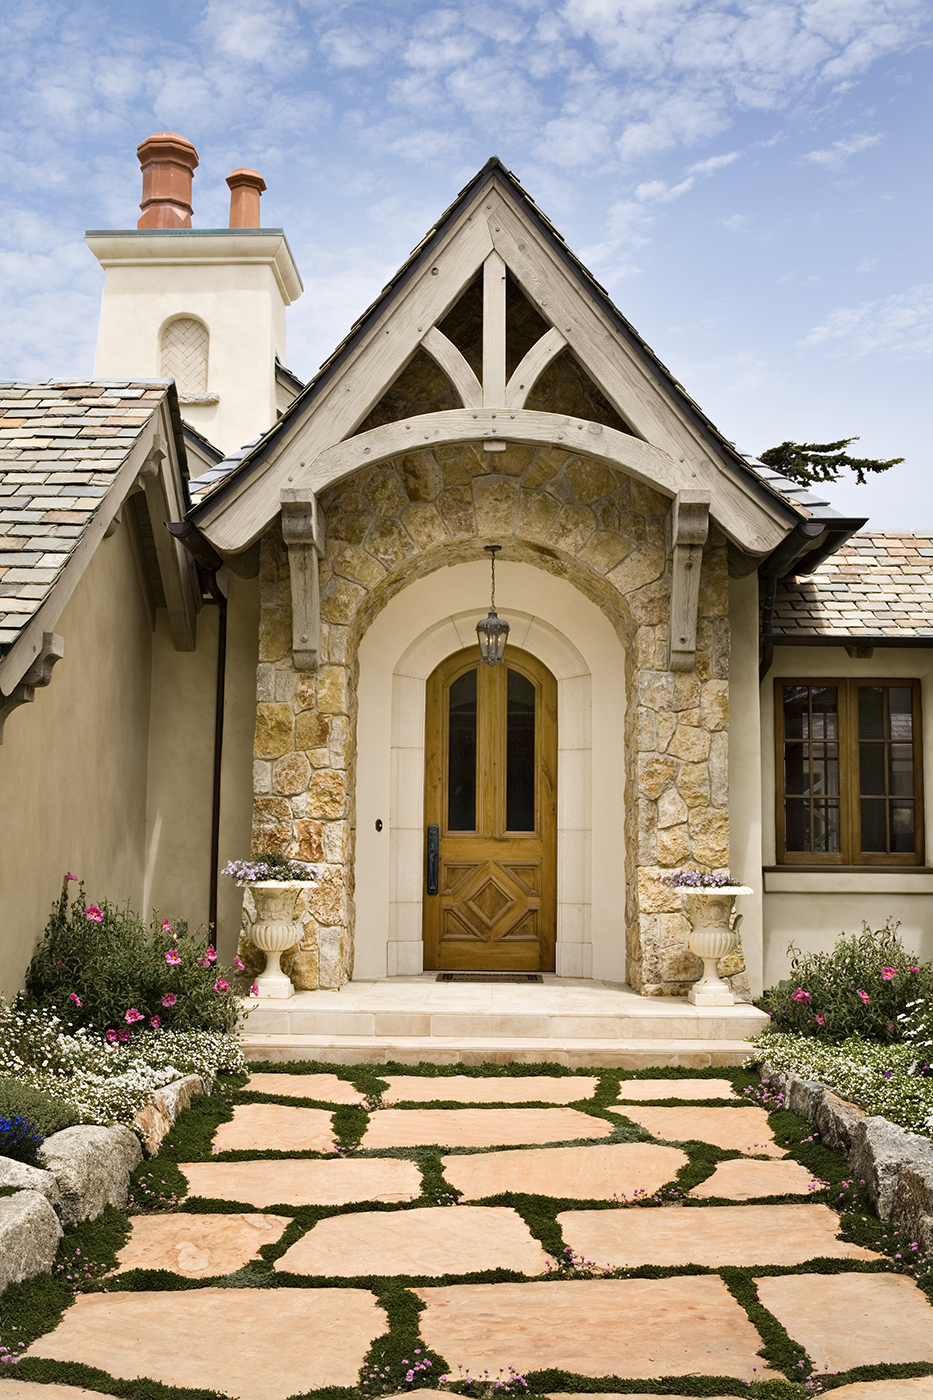 4-Smith-Entry-half-timber arch-limestone surround.jpg